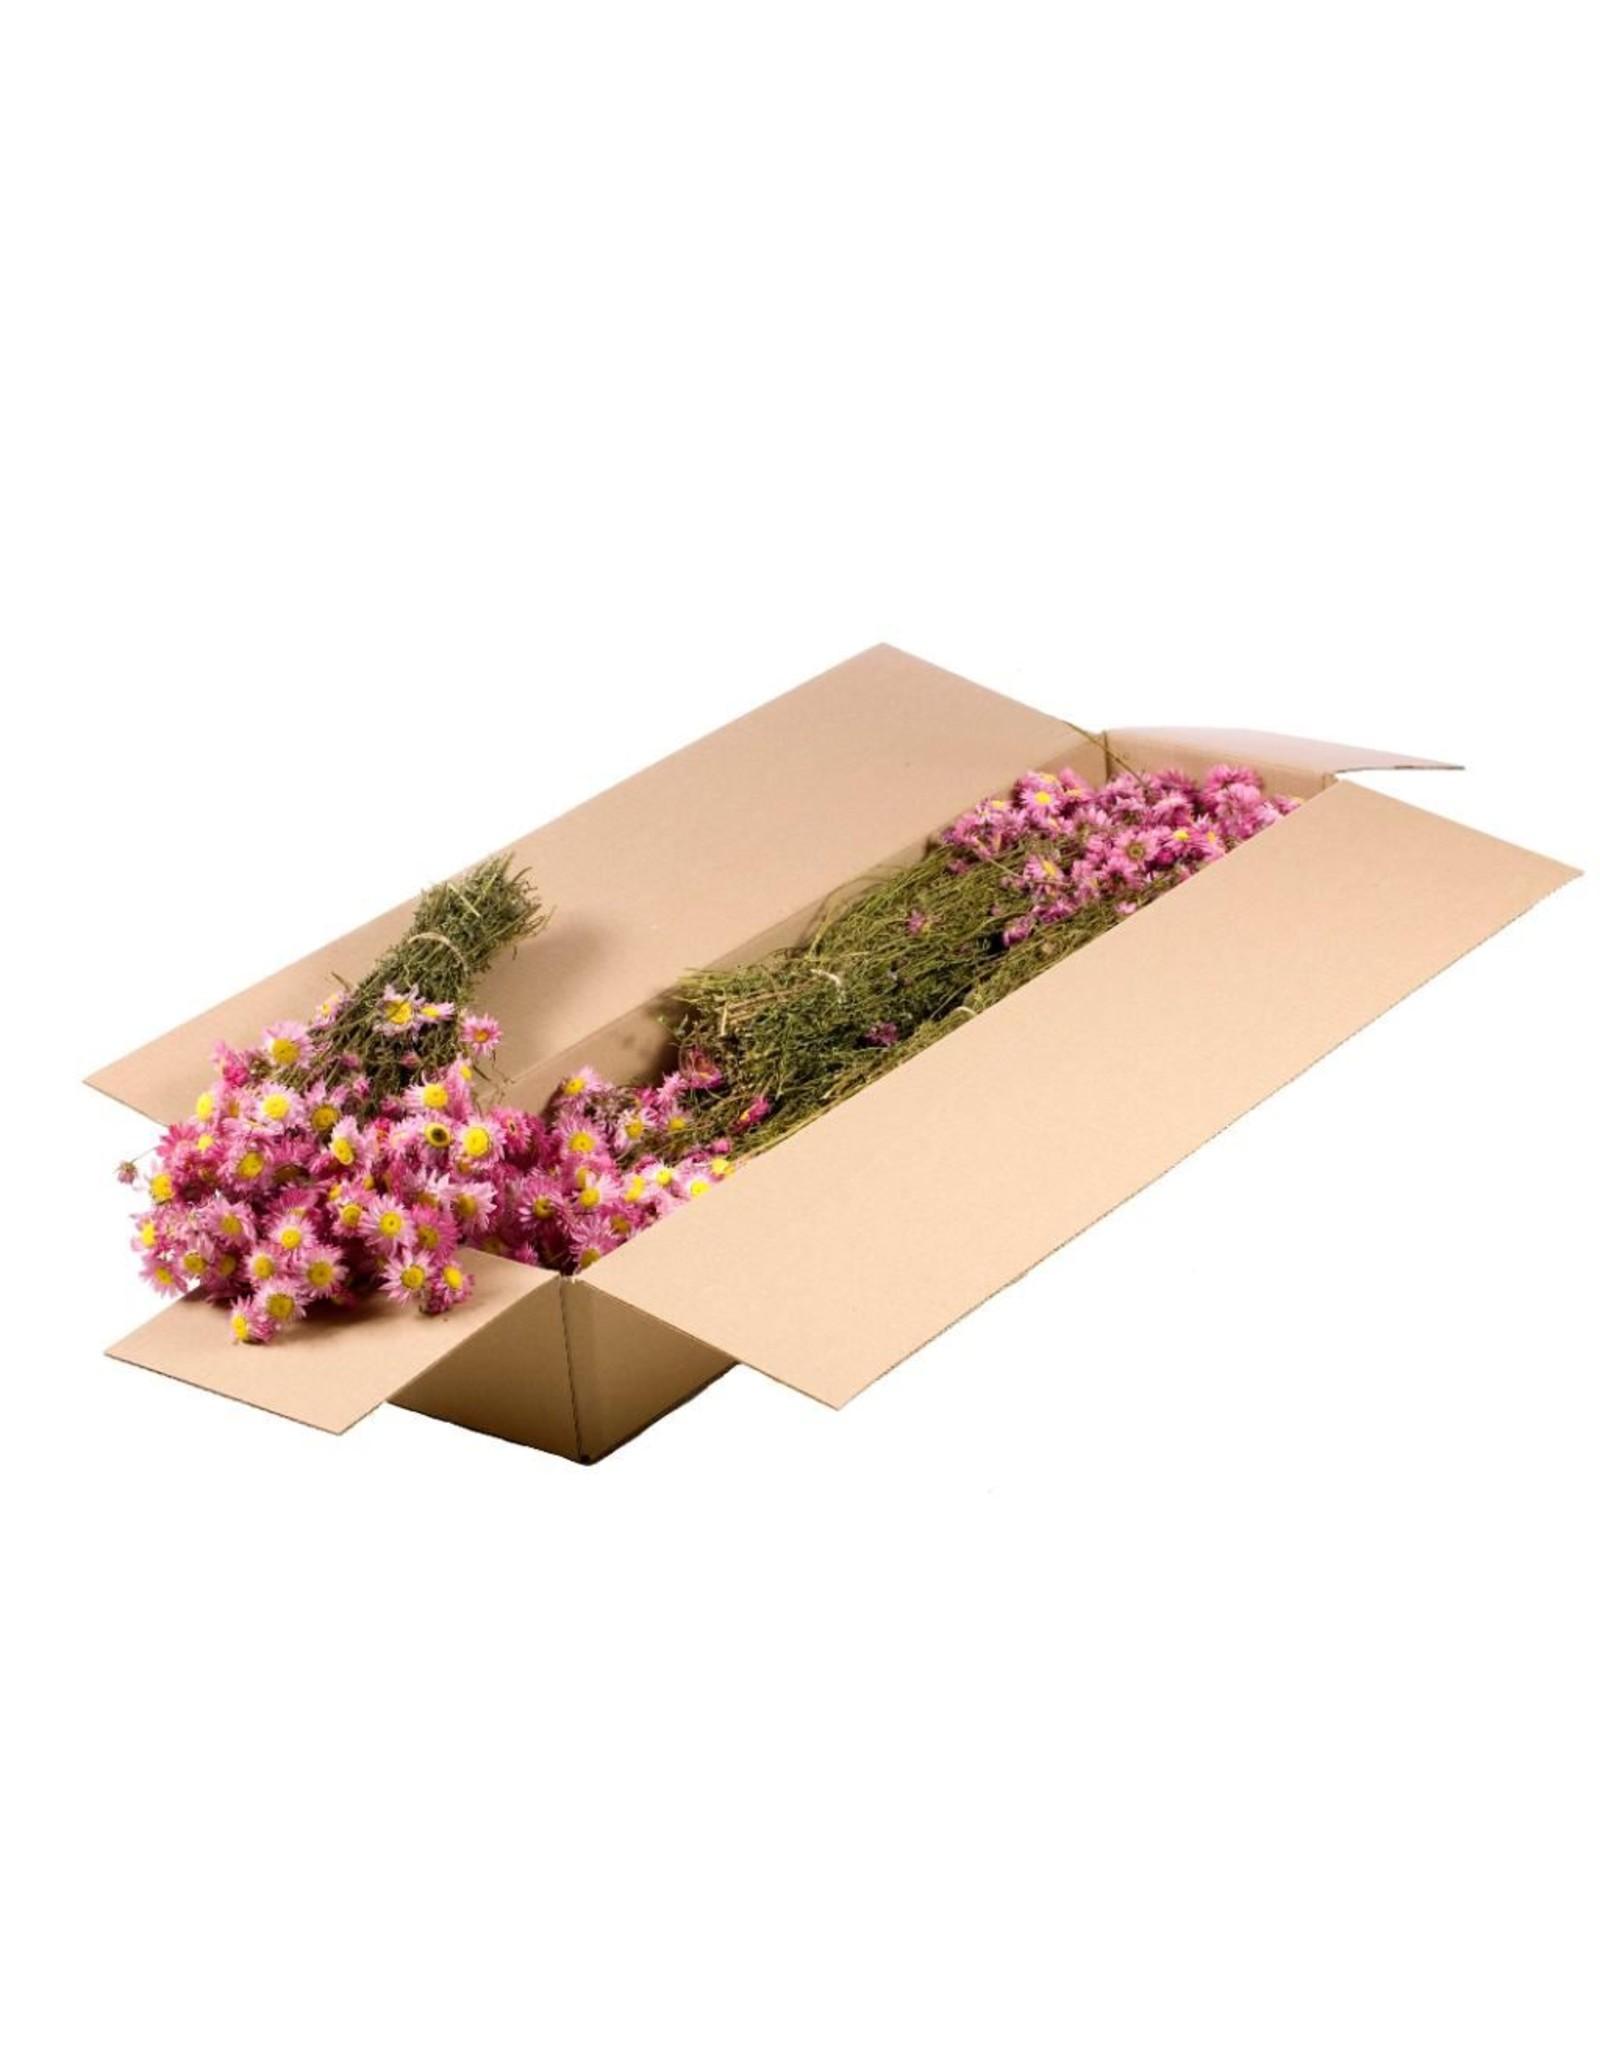 AM Acroclinium droogbloemen groothandel naturel roze (x 5)